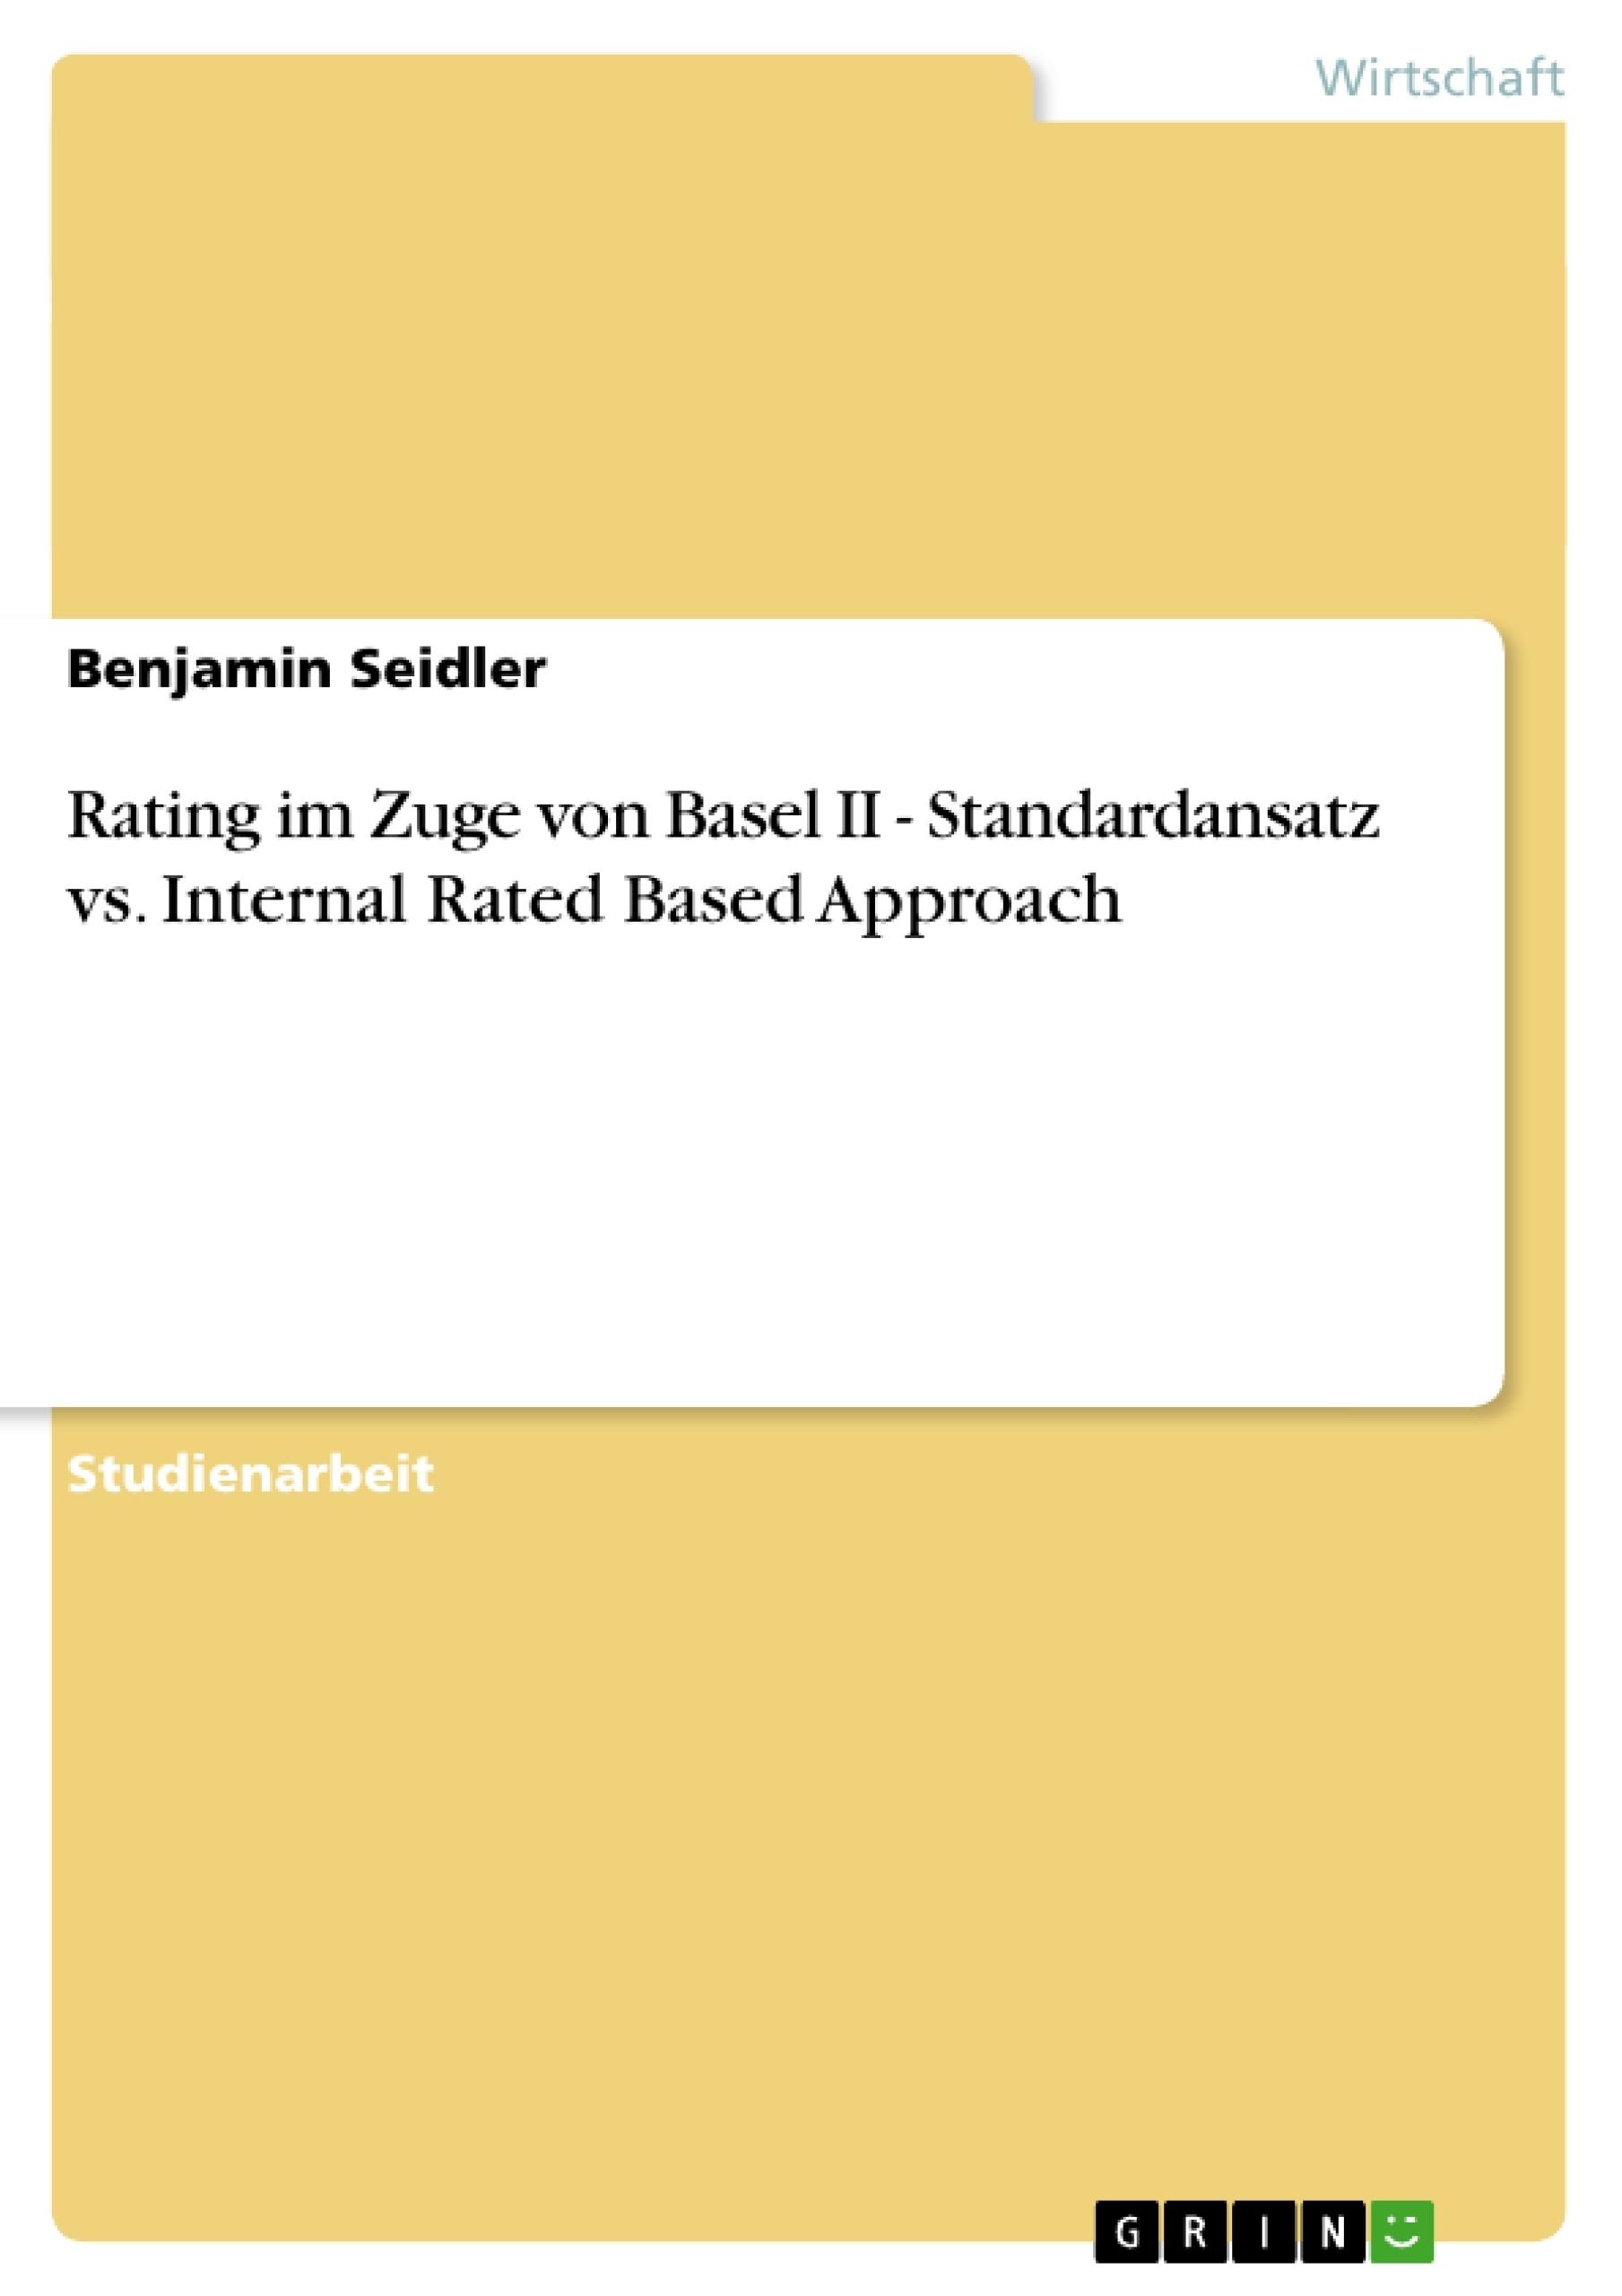 Titel: Rating im Zuge von Basel II - Standardansatz vs. Internal Rated Based Approach